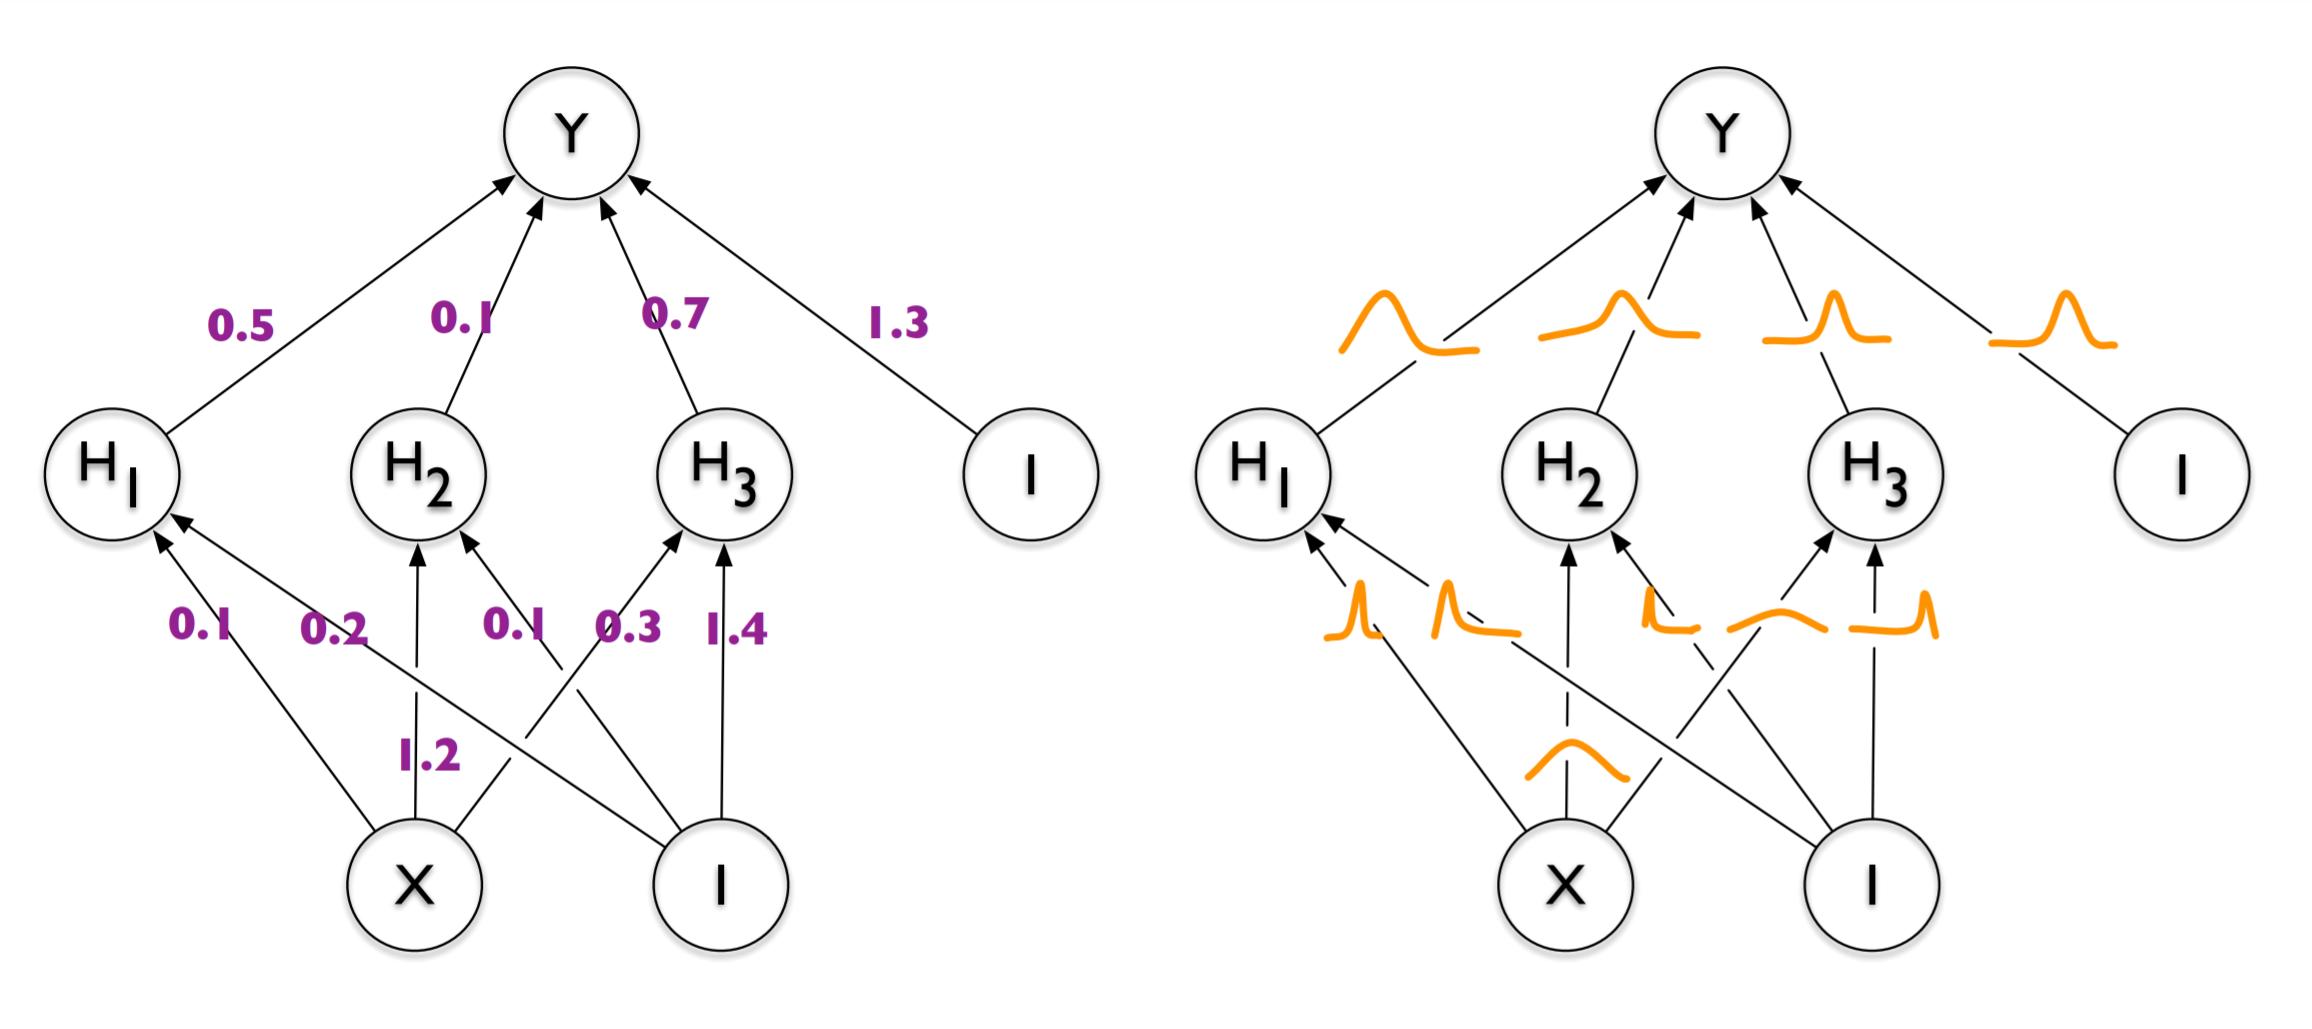 Probabilistic vs. deterministic neural networks